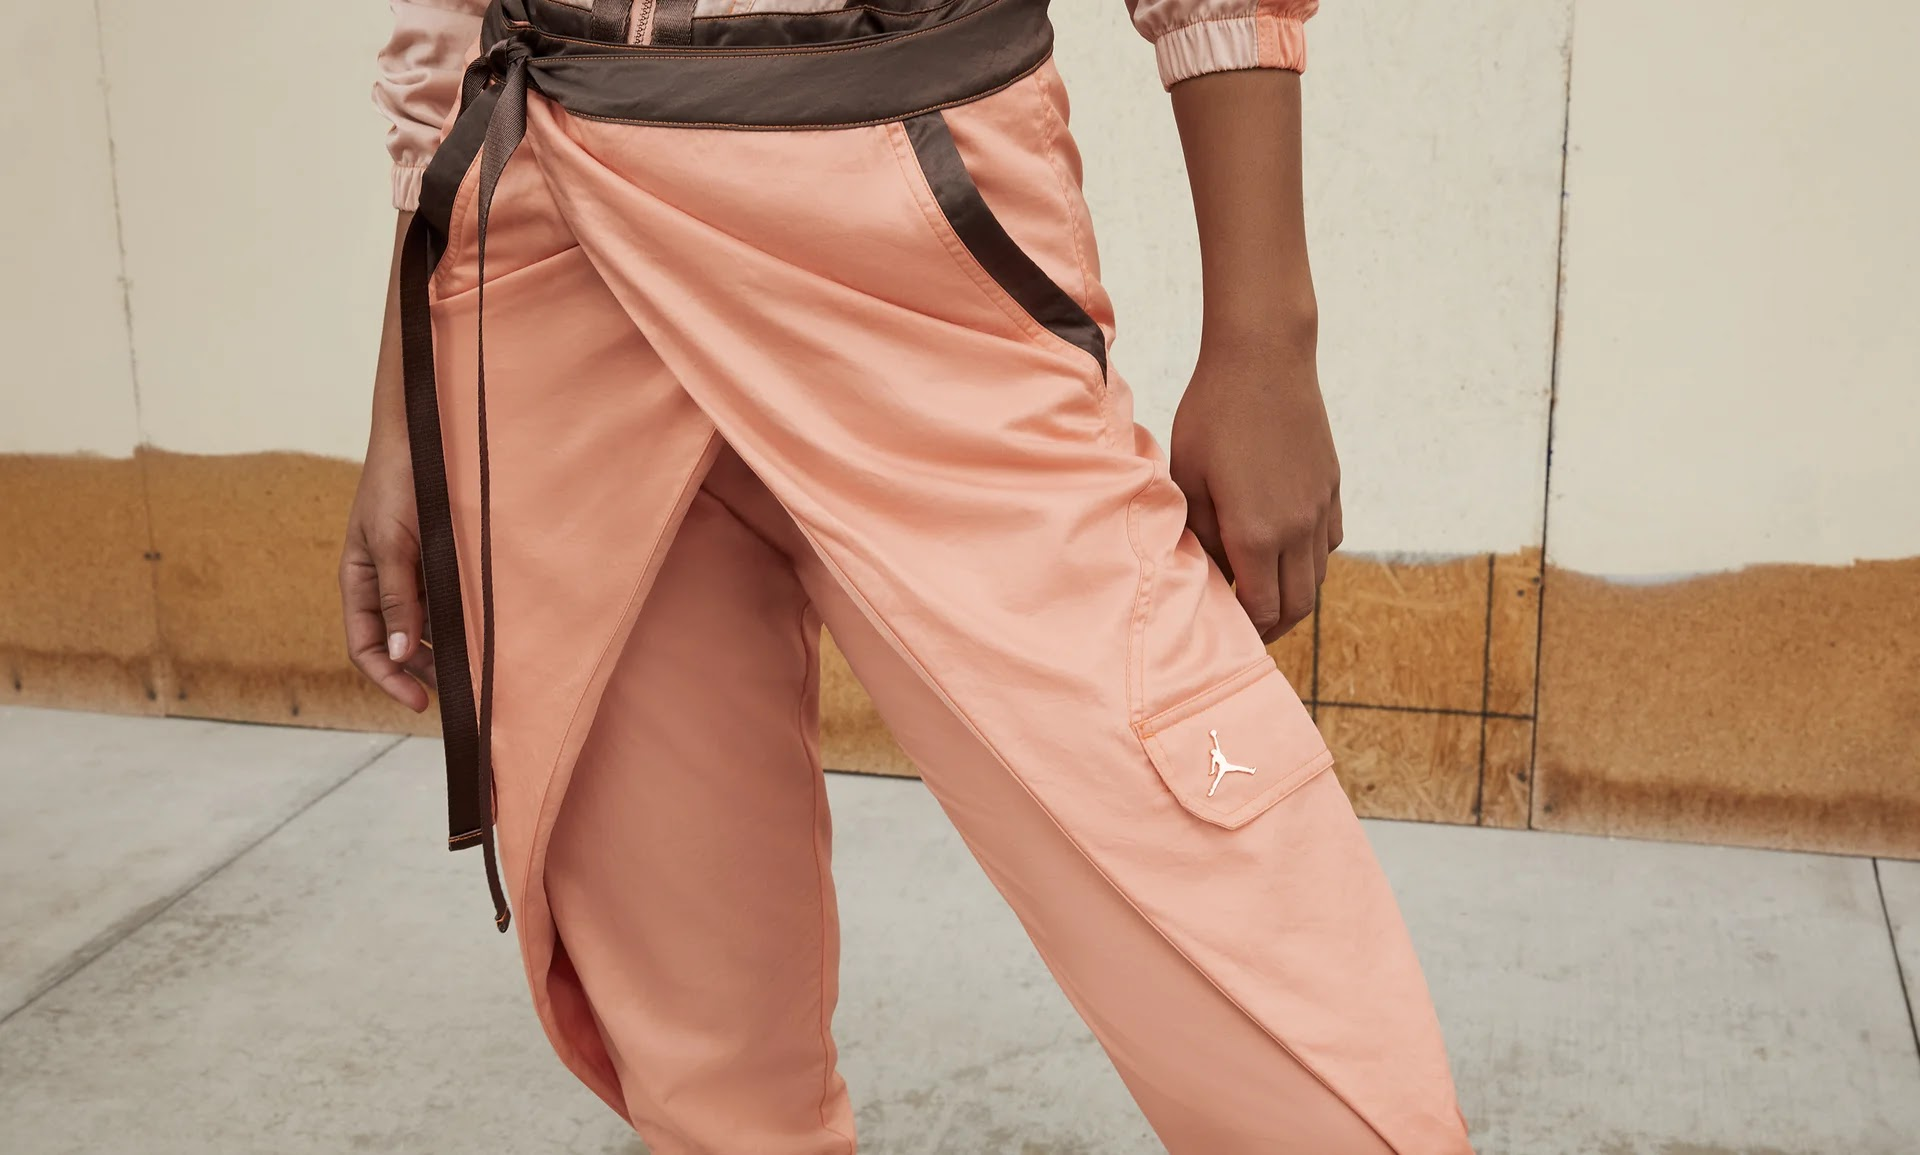 Nike-jordan-brand-ma-2-air-max-200-and-women-s-future-primal-apparel nike-jordan-future-primal-womens-flight-suit-DA1517-808-style-3